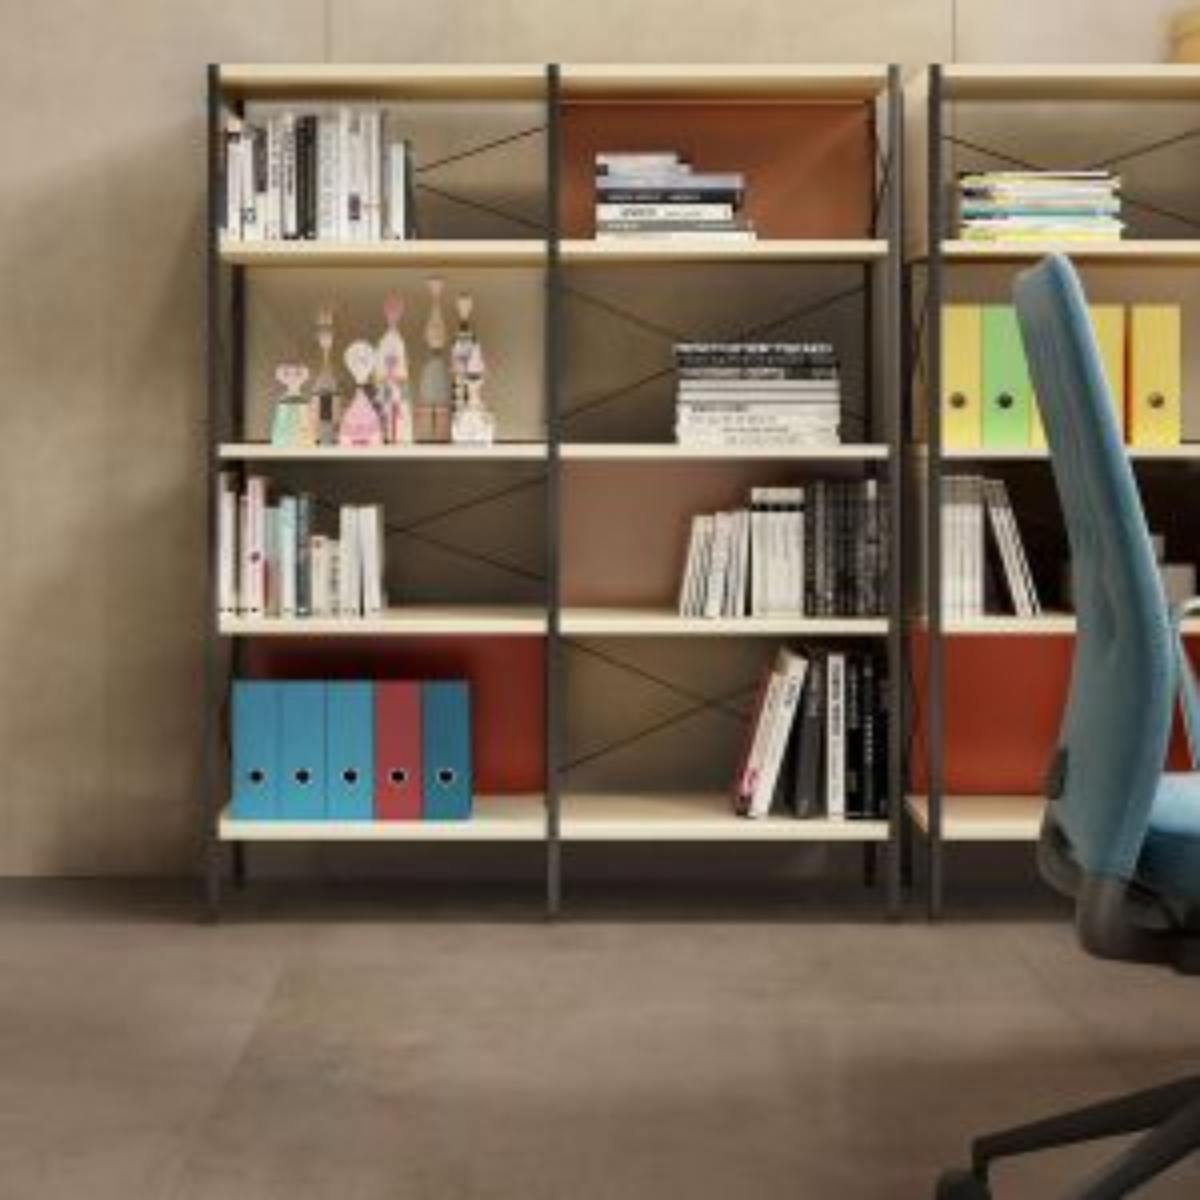 RAK Surface Cool Grey Rustic Tile 300 x 600mm Lifestyle